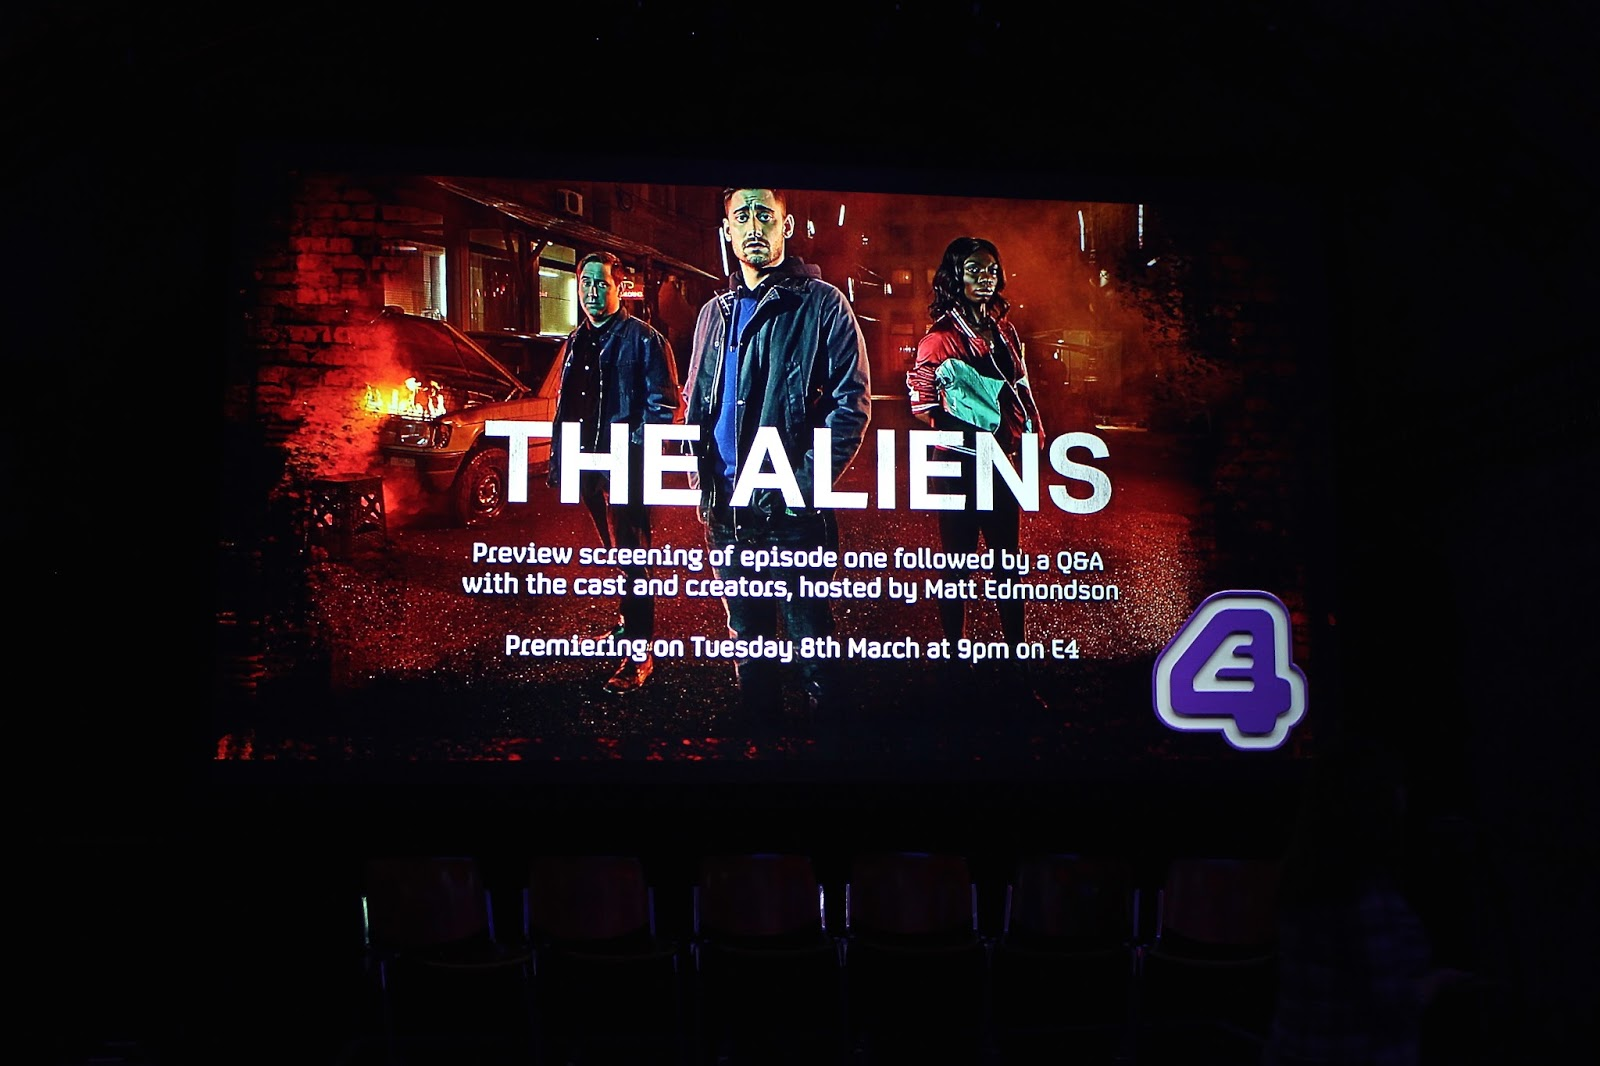 The Aliens Premiere